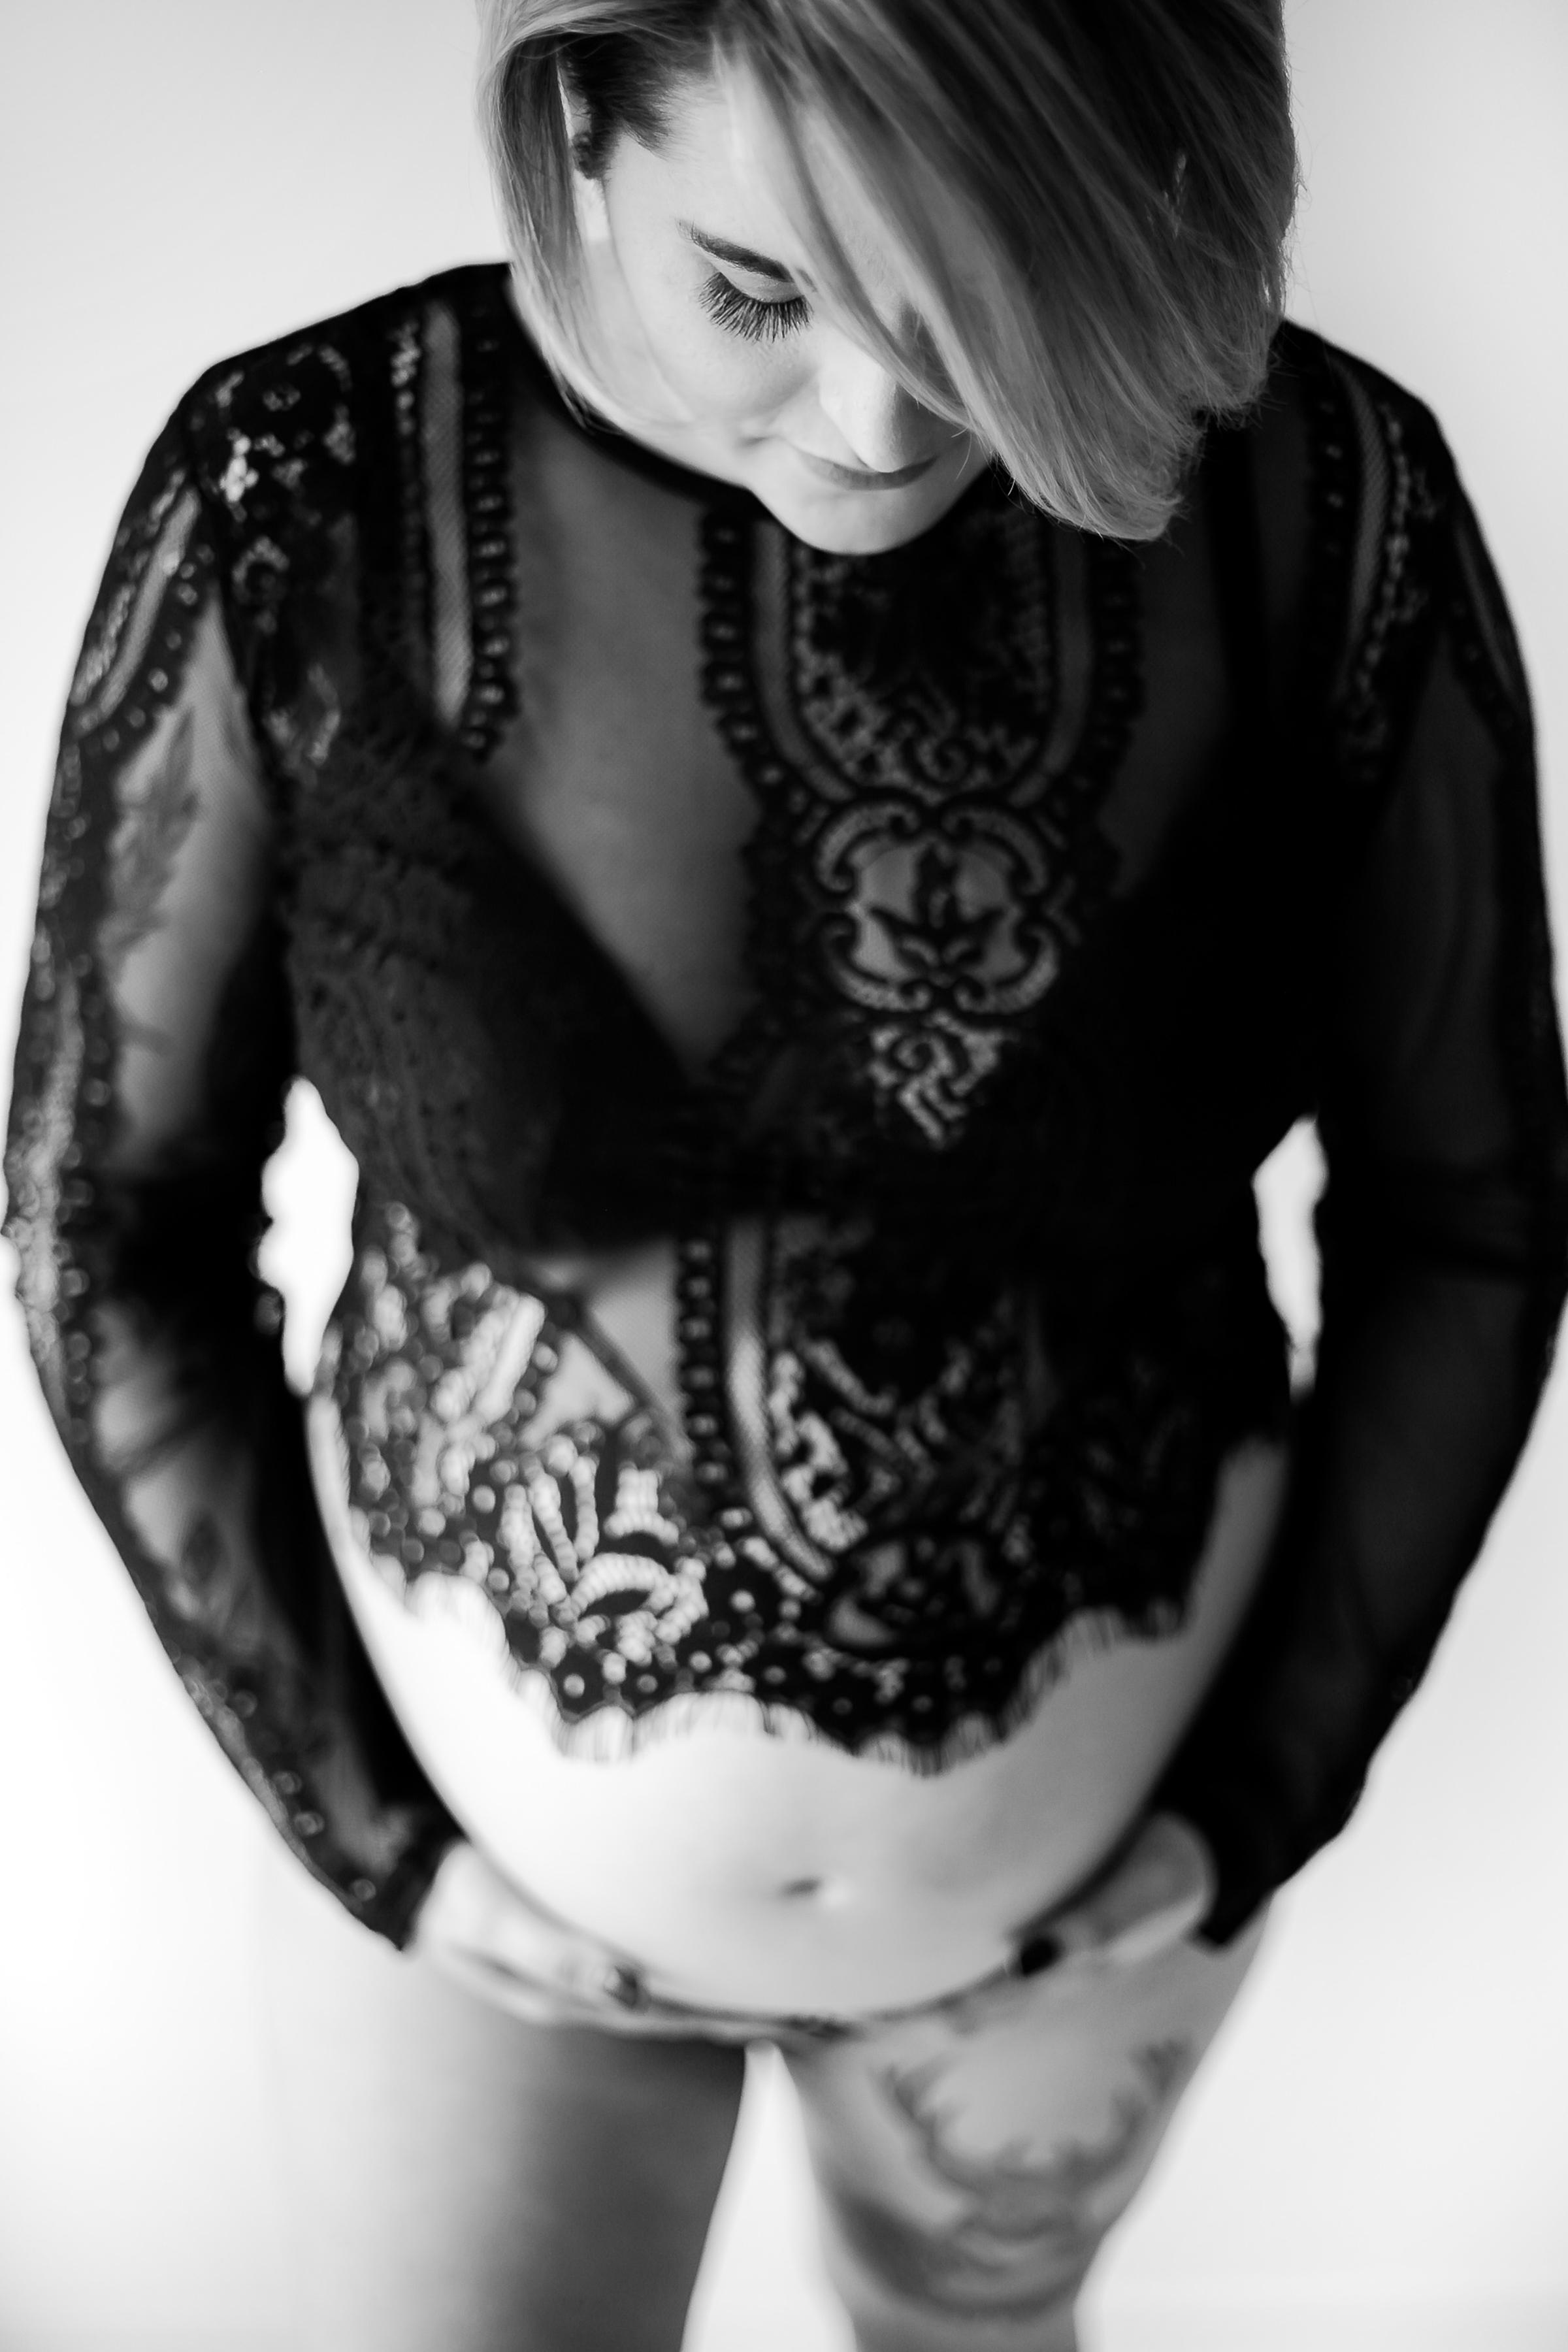 Classic_Boudoir_Maternity_Photographer_Oshawa_Whitby_Port Perry_Toronto_Petra_King_Photography